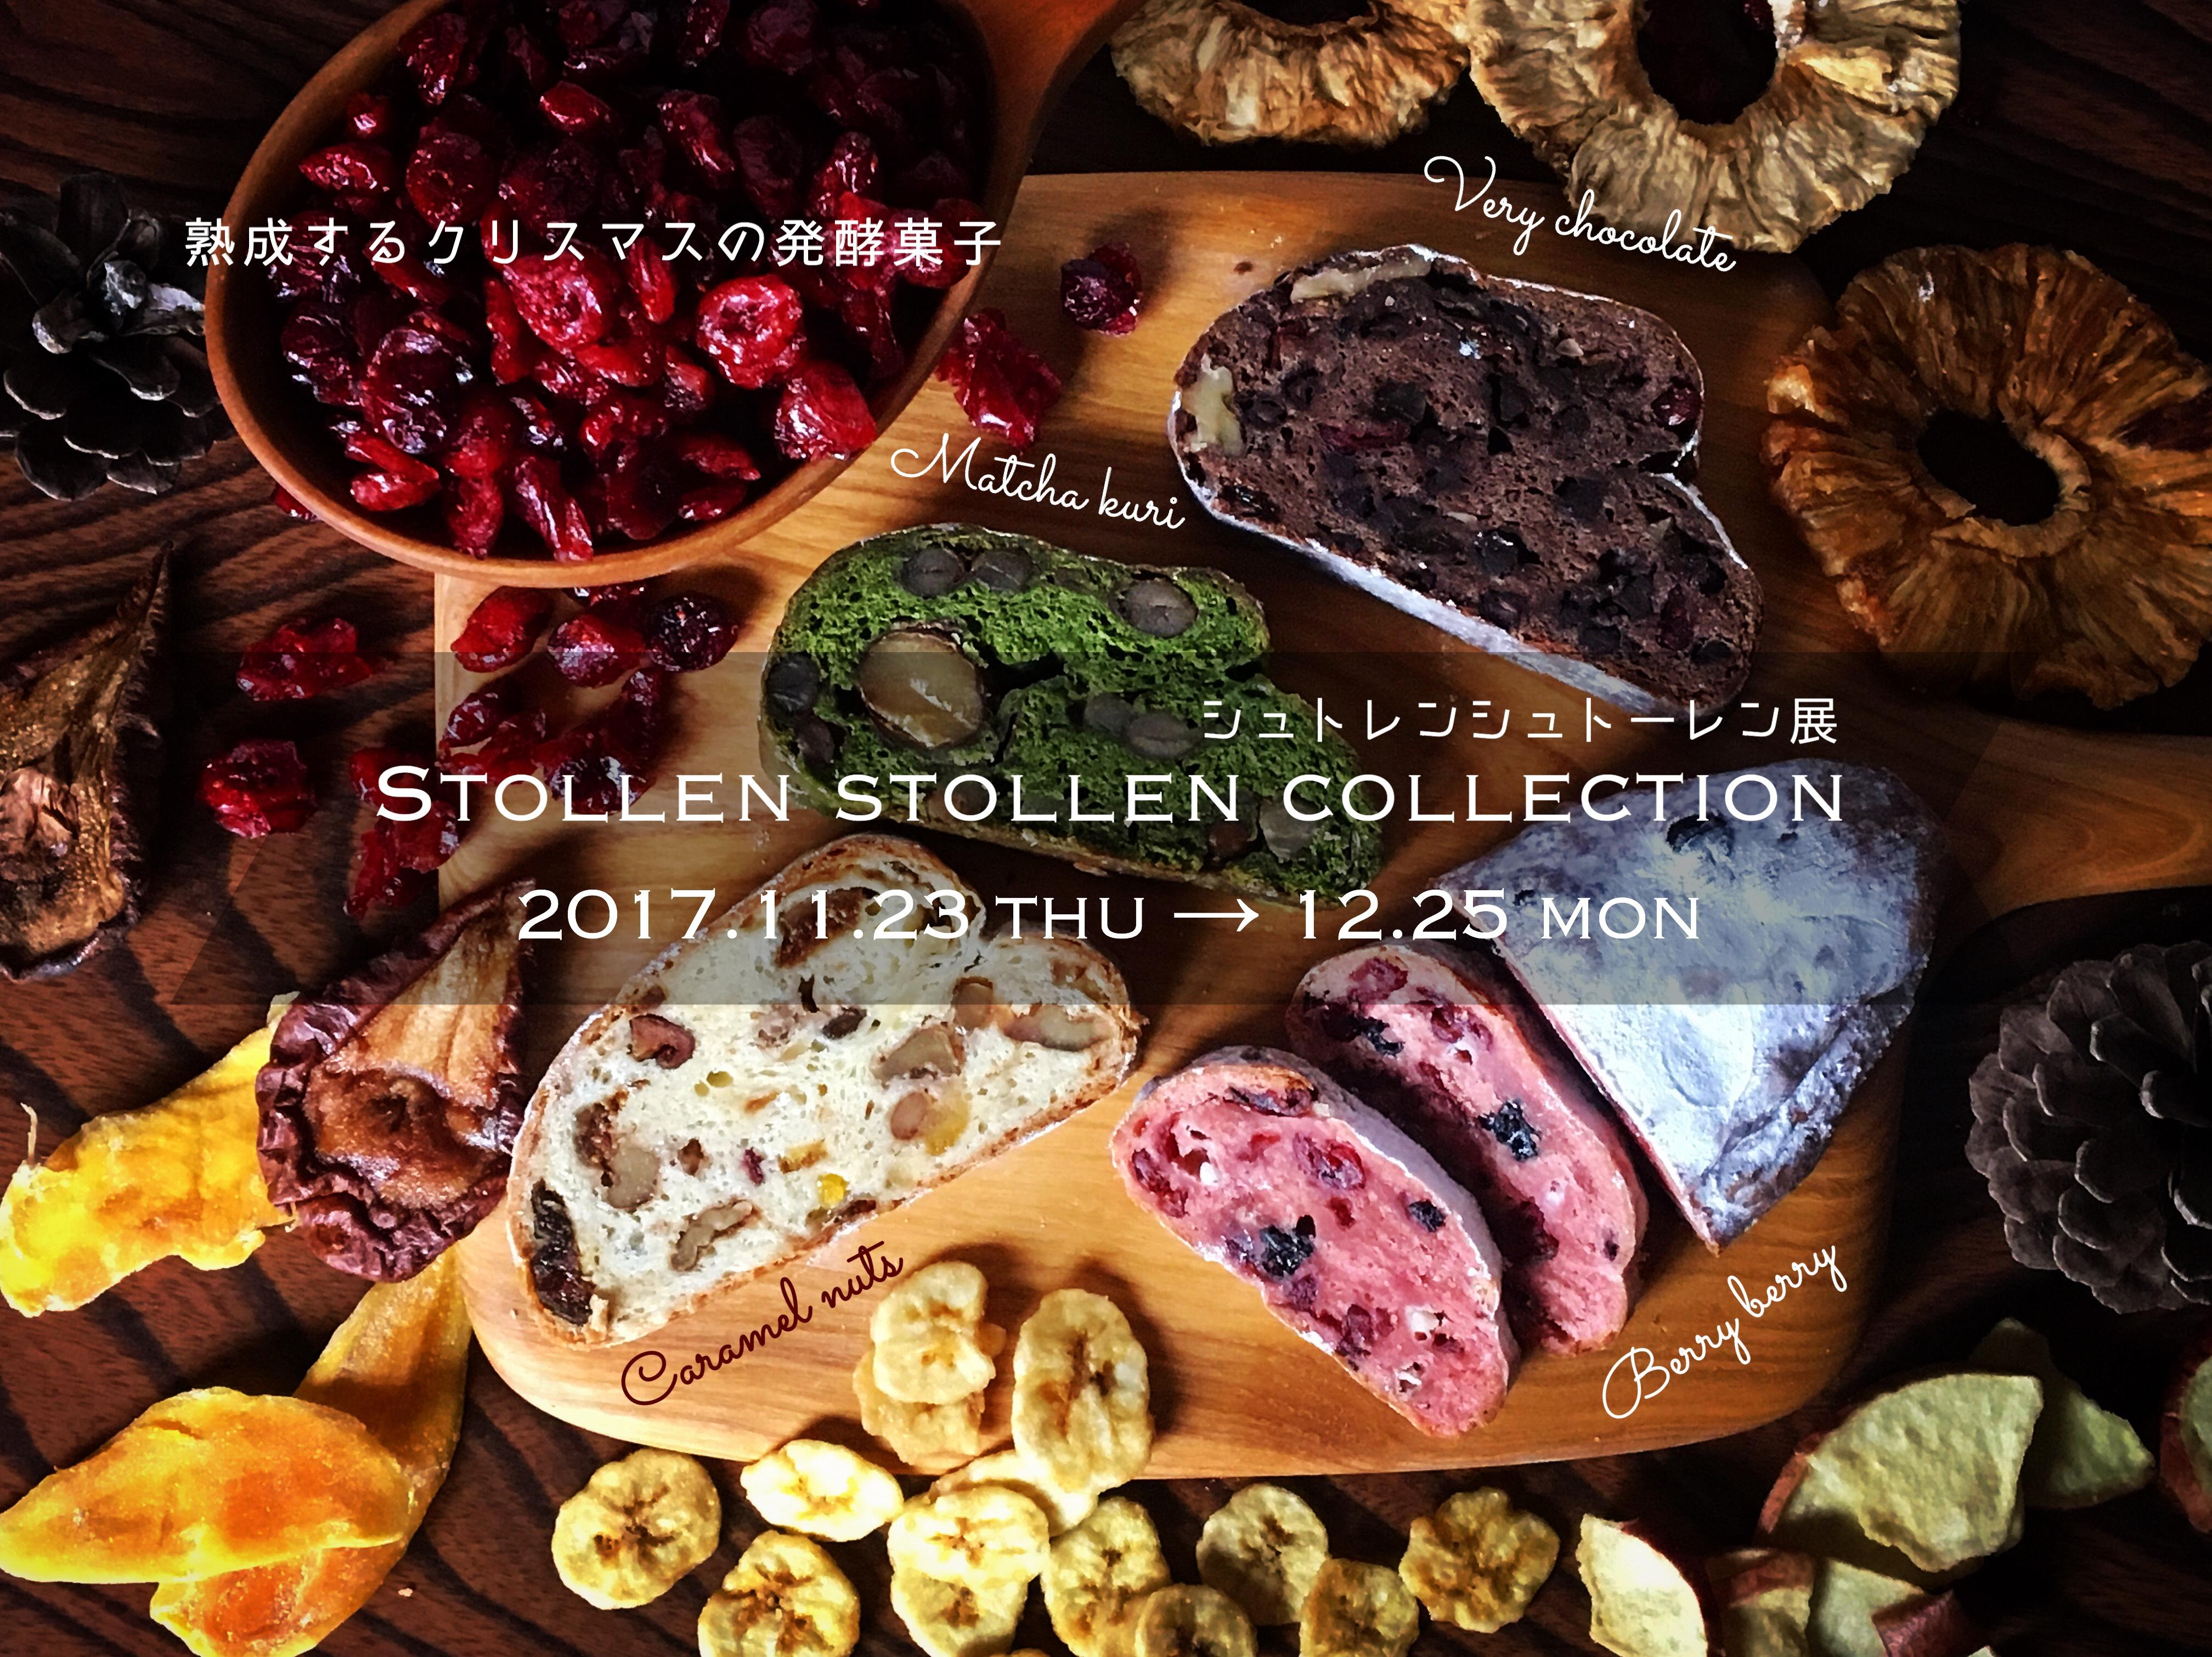 【FUKURA個展】シュトレンシュトーレン展 ~熟成するクリスマスの発酵菓子